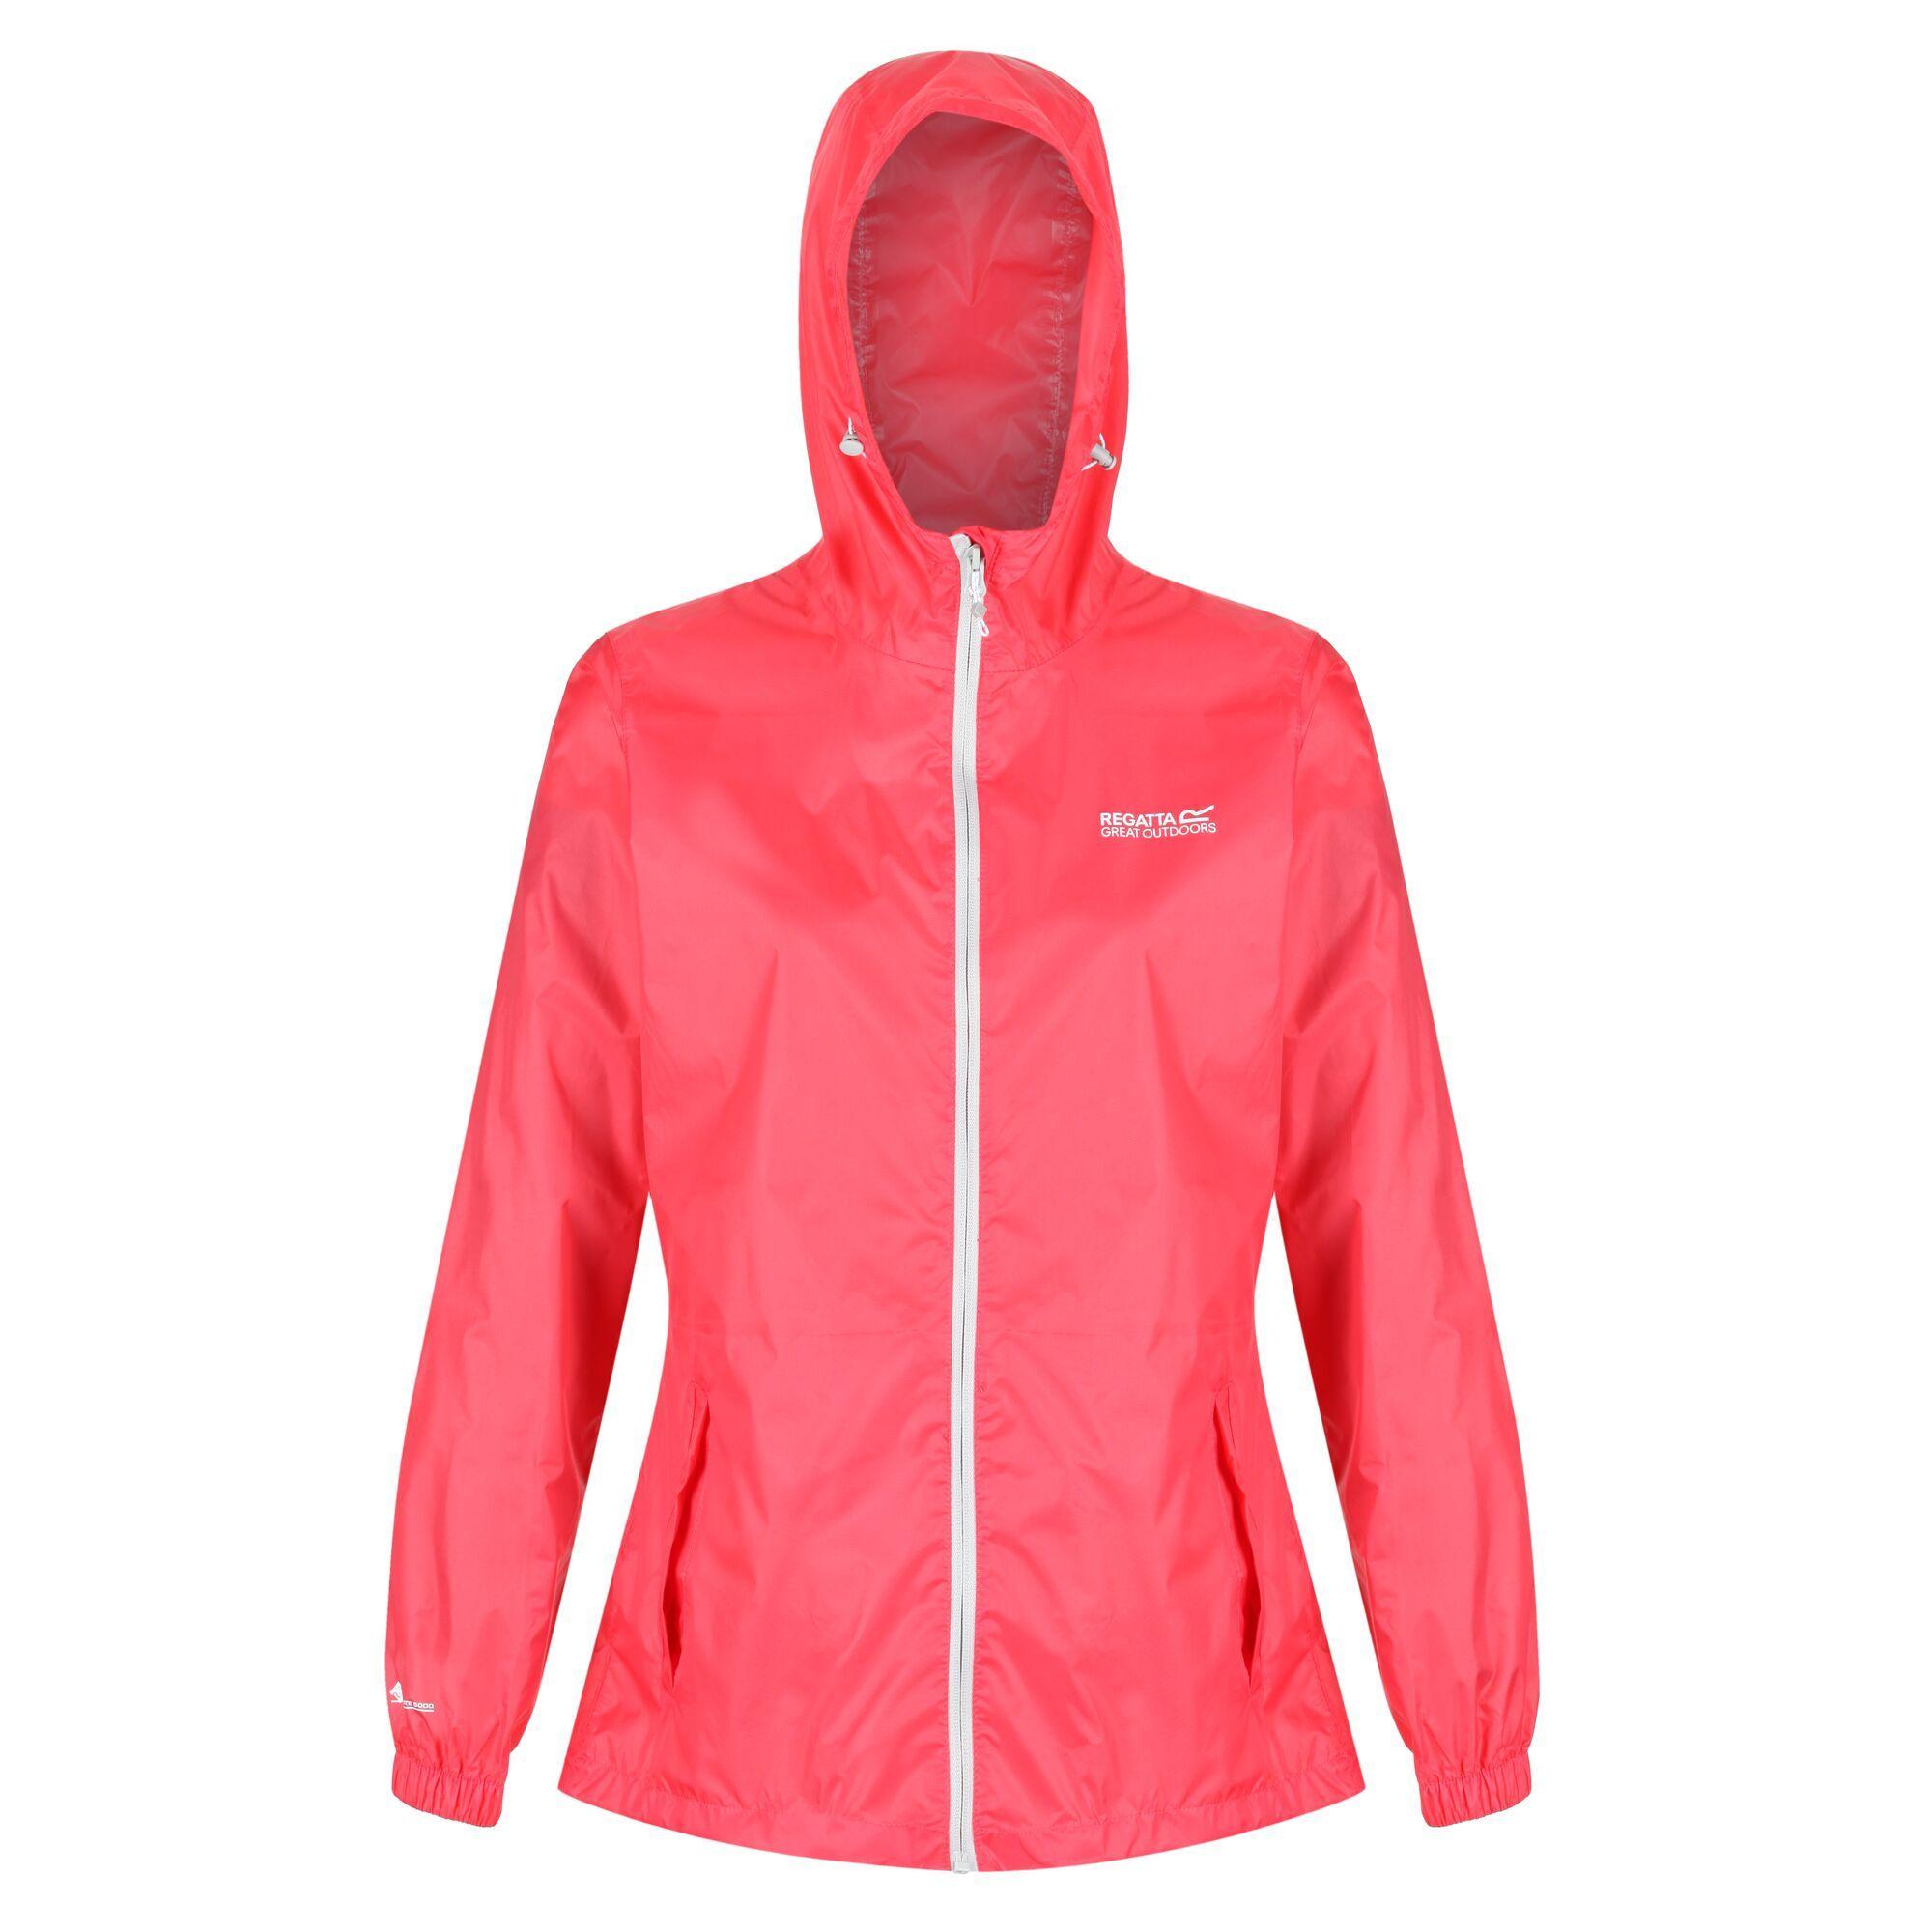 Regatta Womens/Ladies Pk It Jkt III Waterproof Hooded Jacket (10 UK) (Neon Pink)